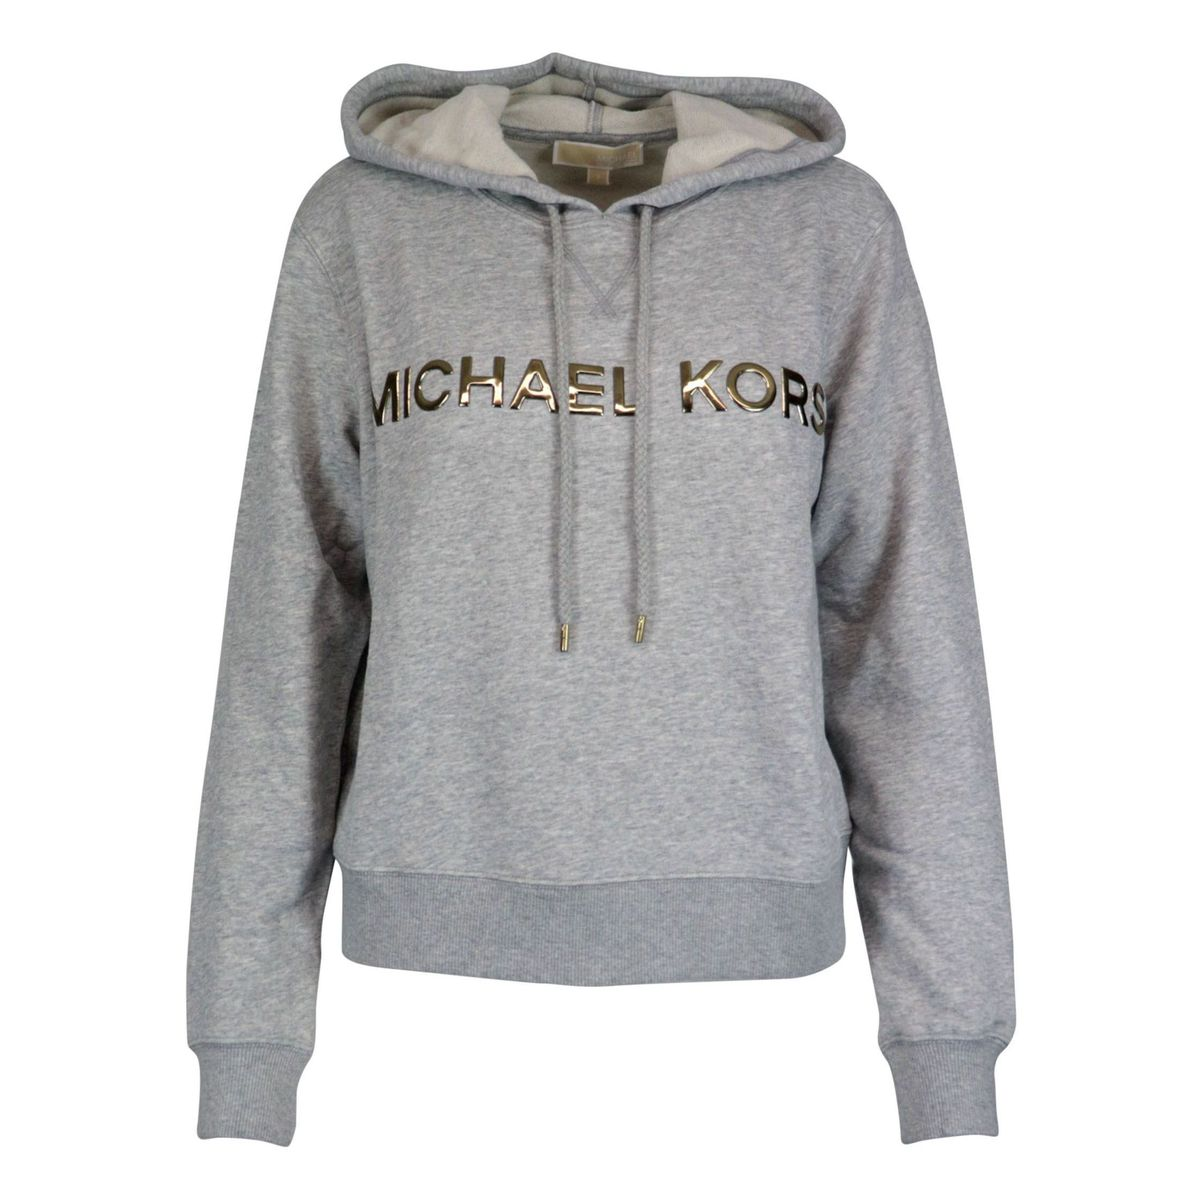 Cotton blend sweatshirt with hood and logo writing Light grey Michael Kors